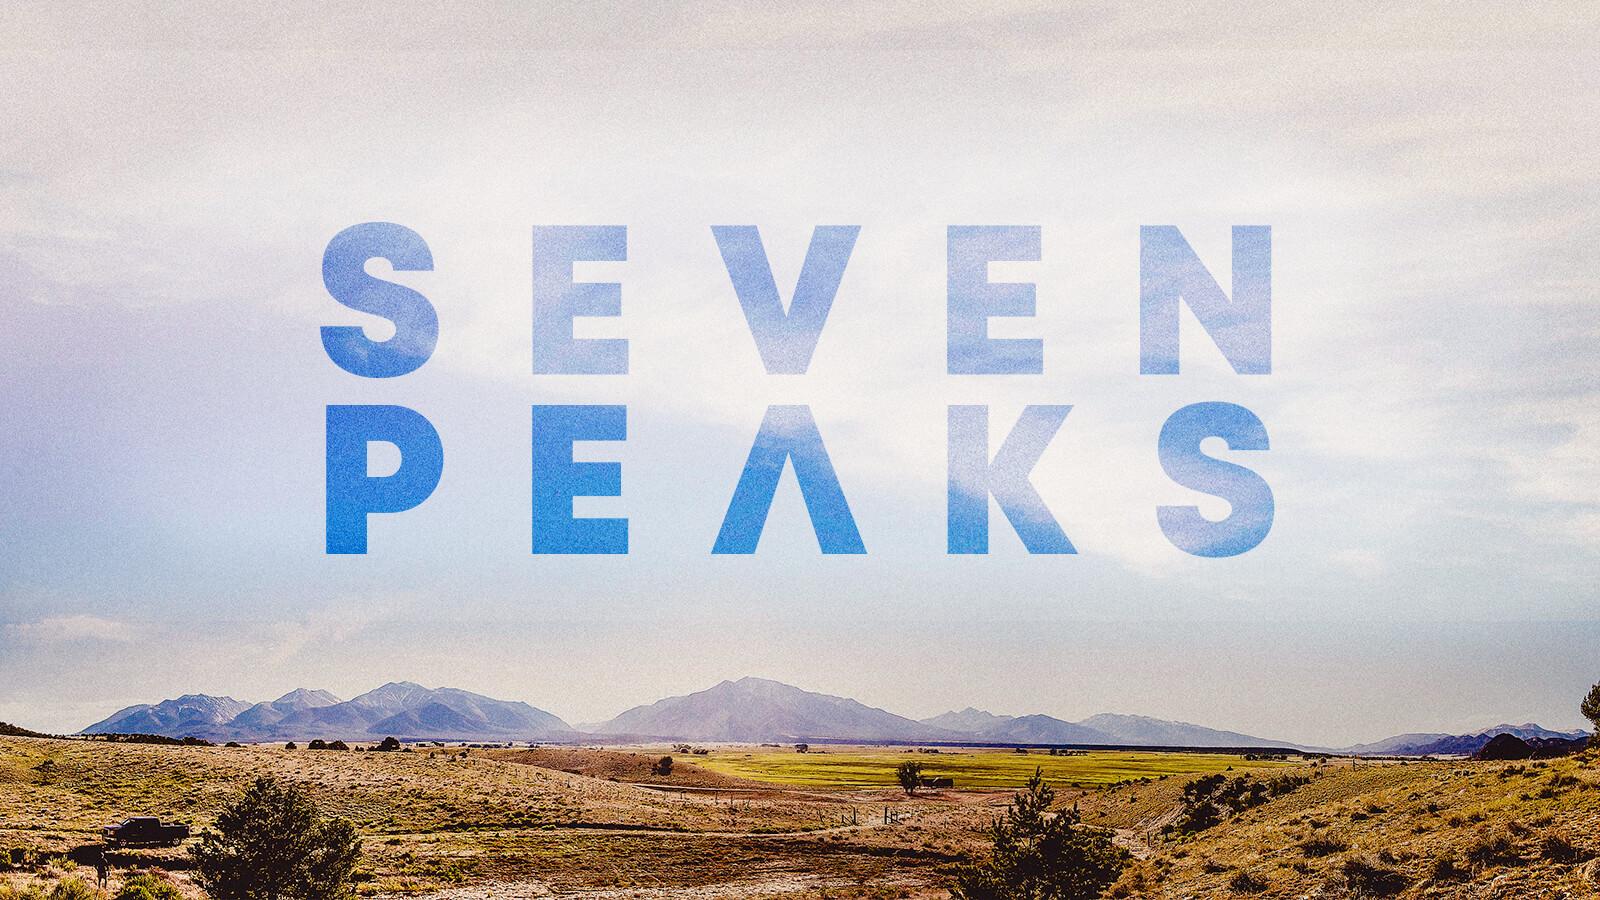 Live Nation & Dierks Bentley's Seven Peaks festival website design by Ben Fieker